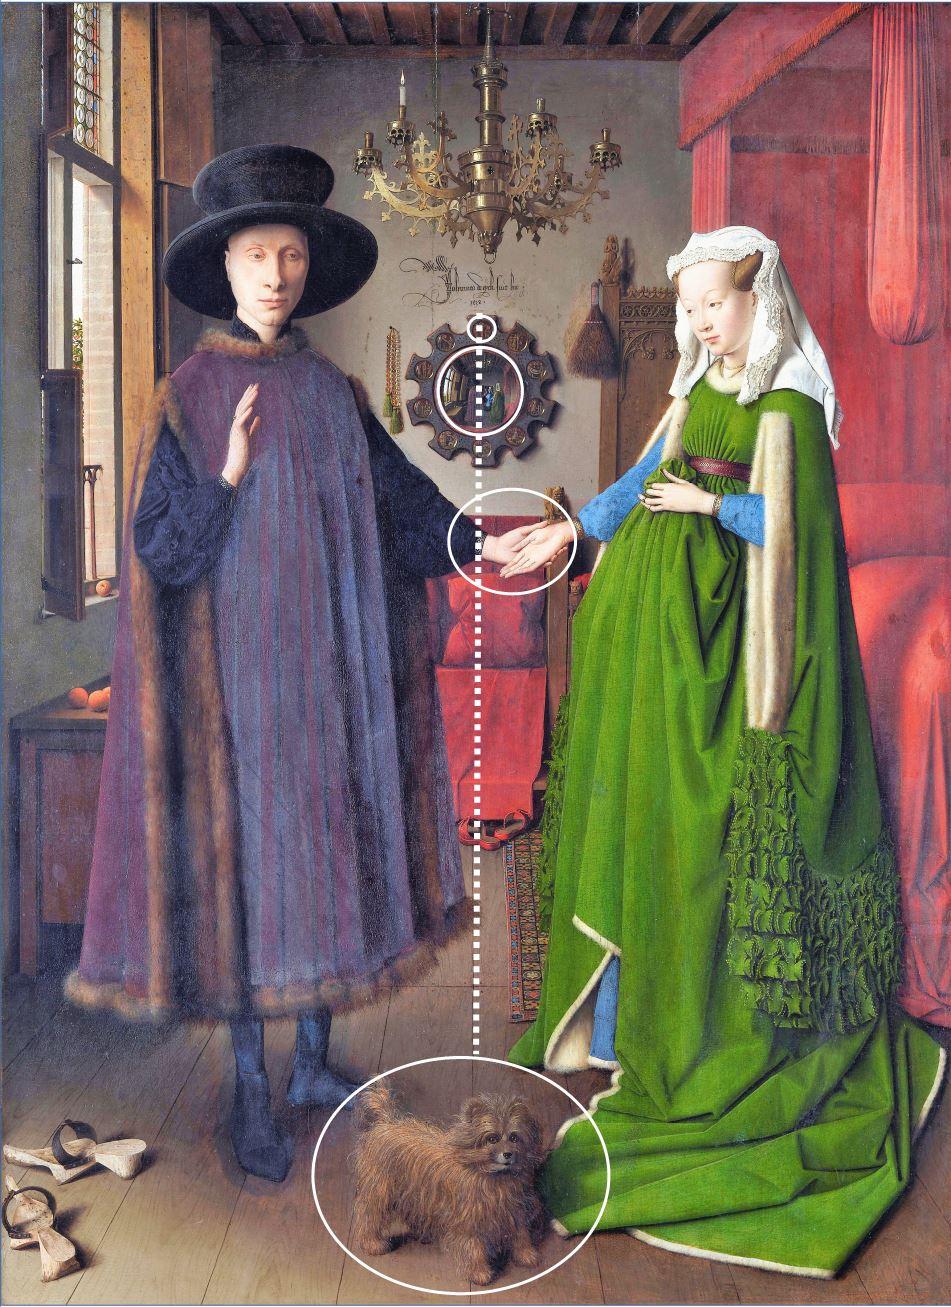 Van_Eyck 1434 _Arnolfini_Portrait schema Baldwin